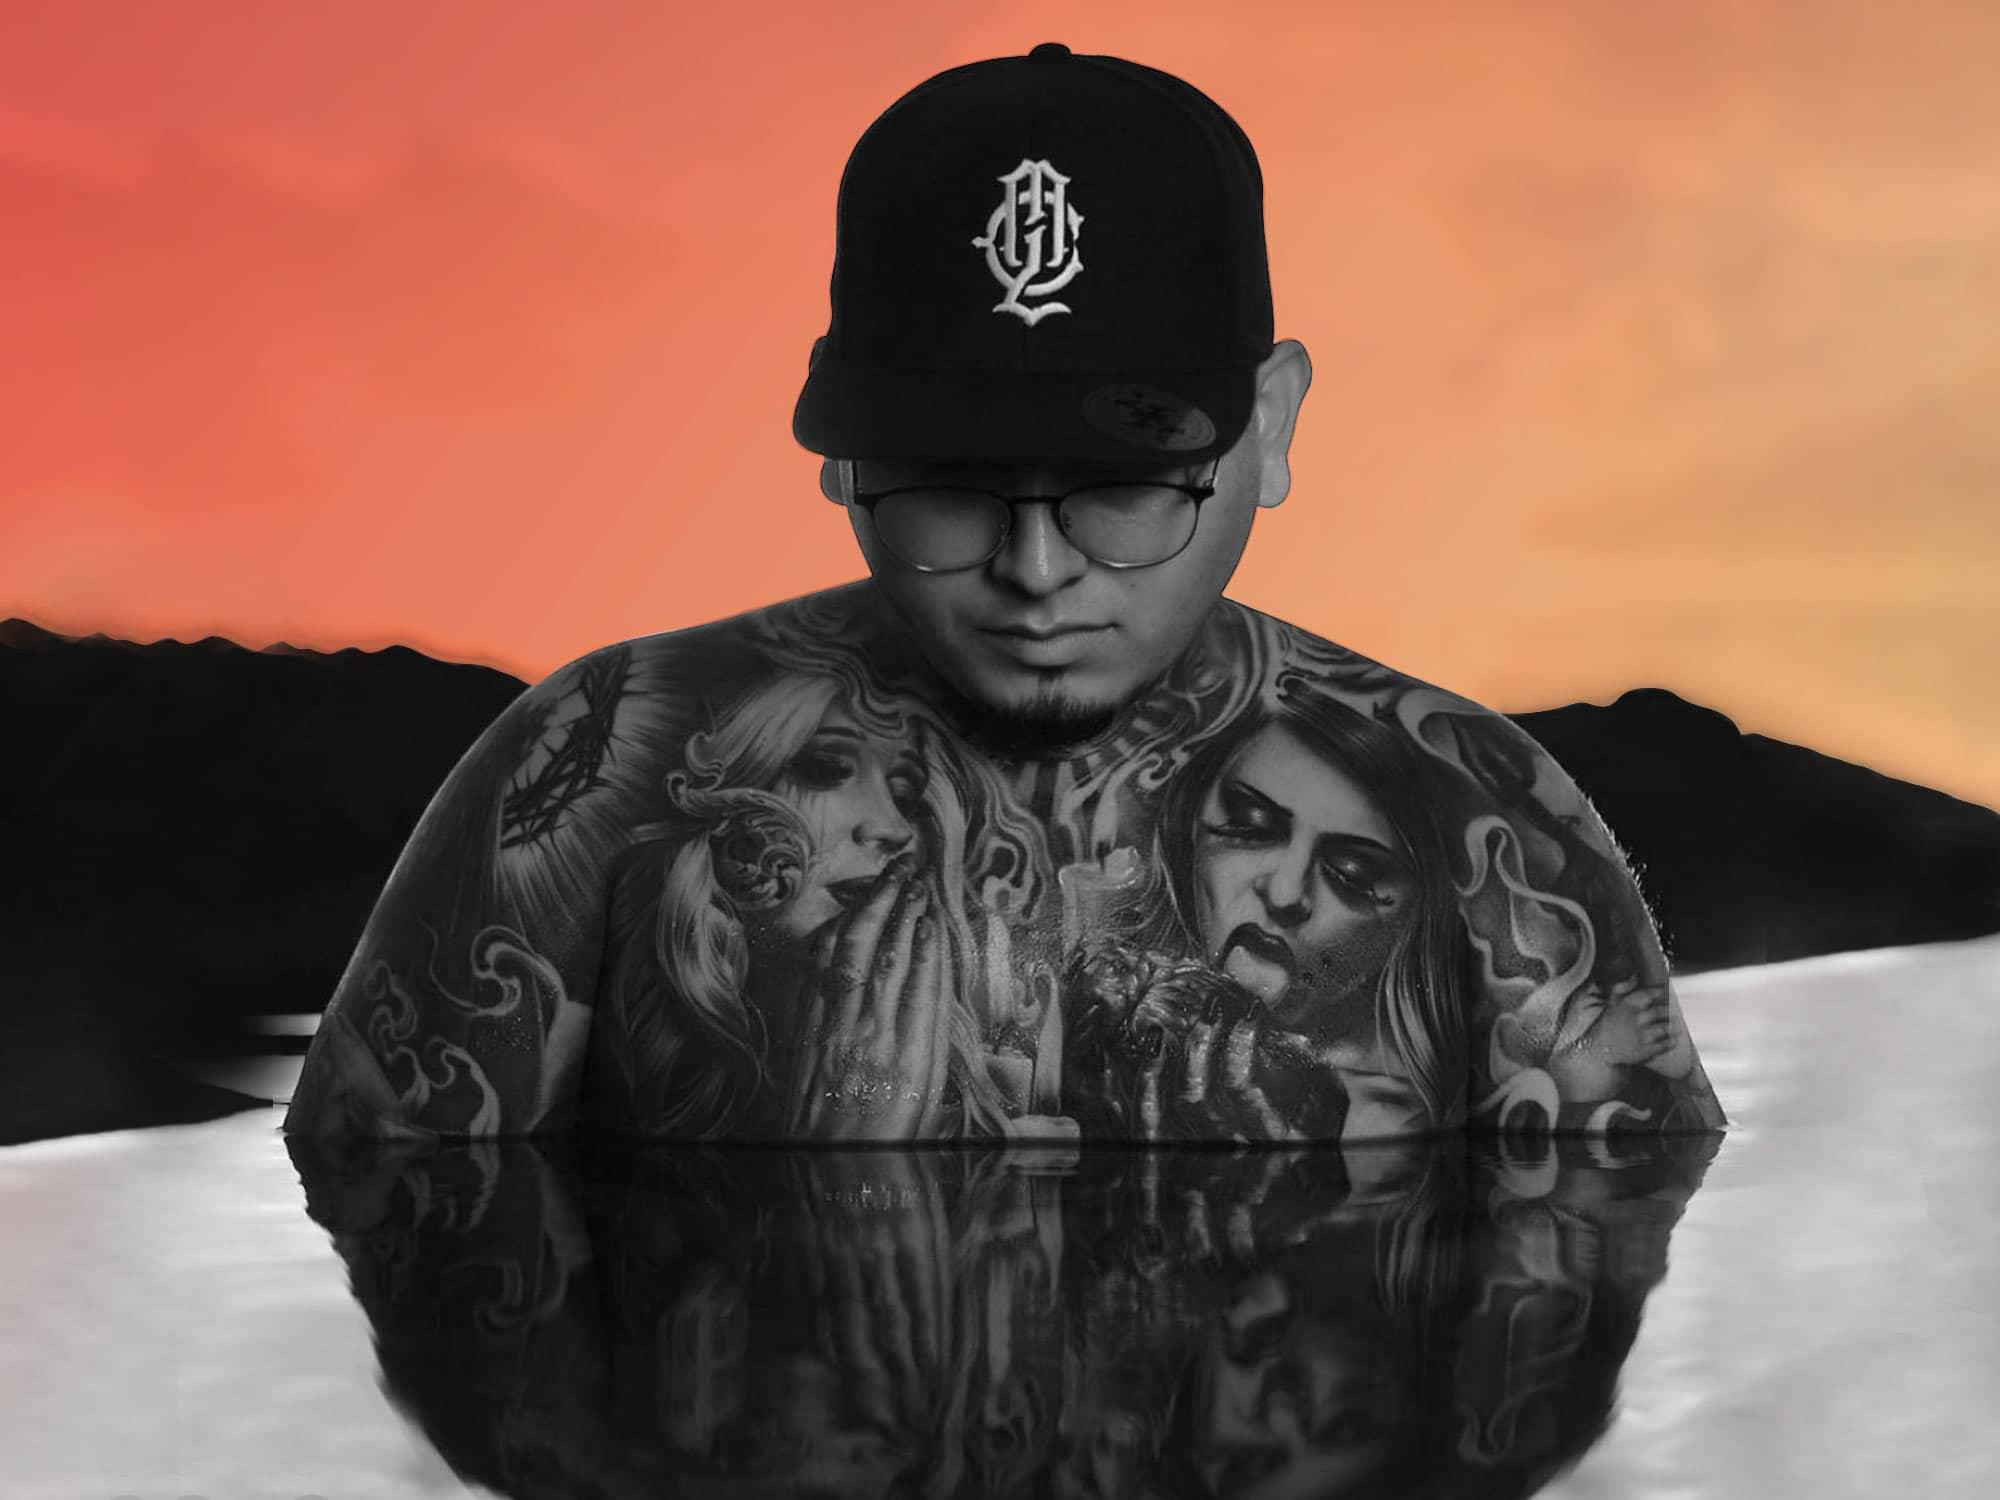 My Last Chance - Apparel Branding, Cap Logo, Model With Tattoos